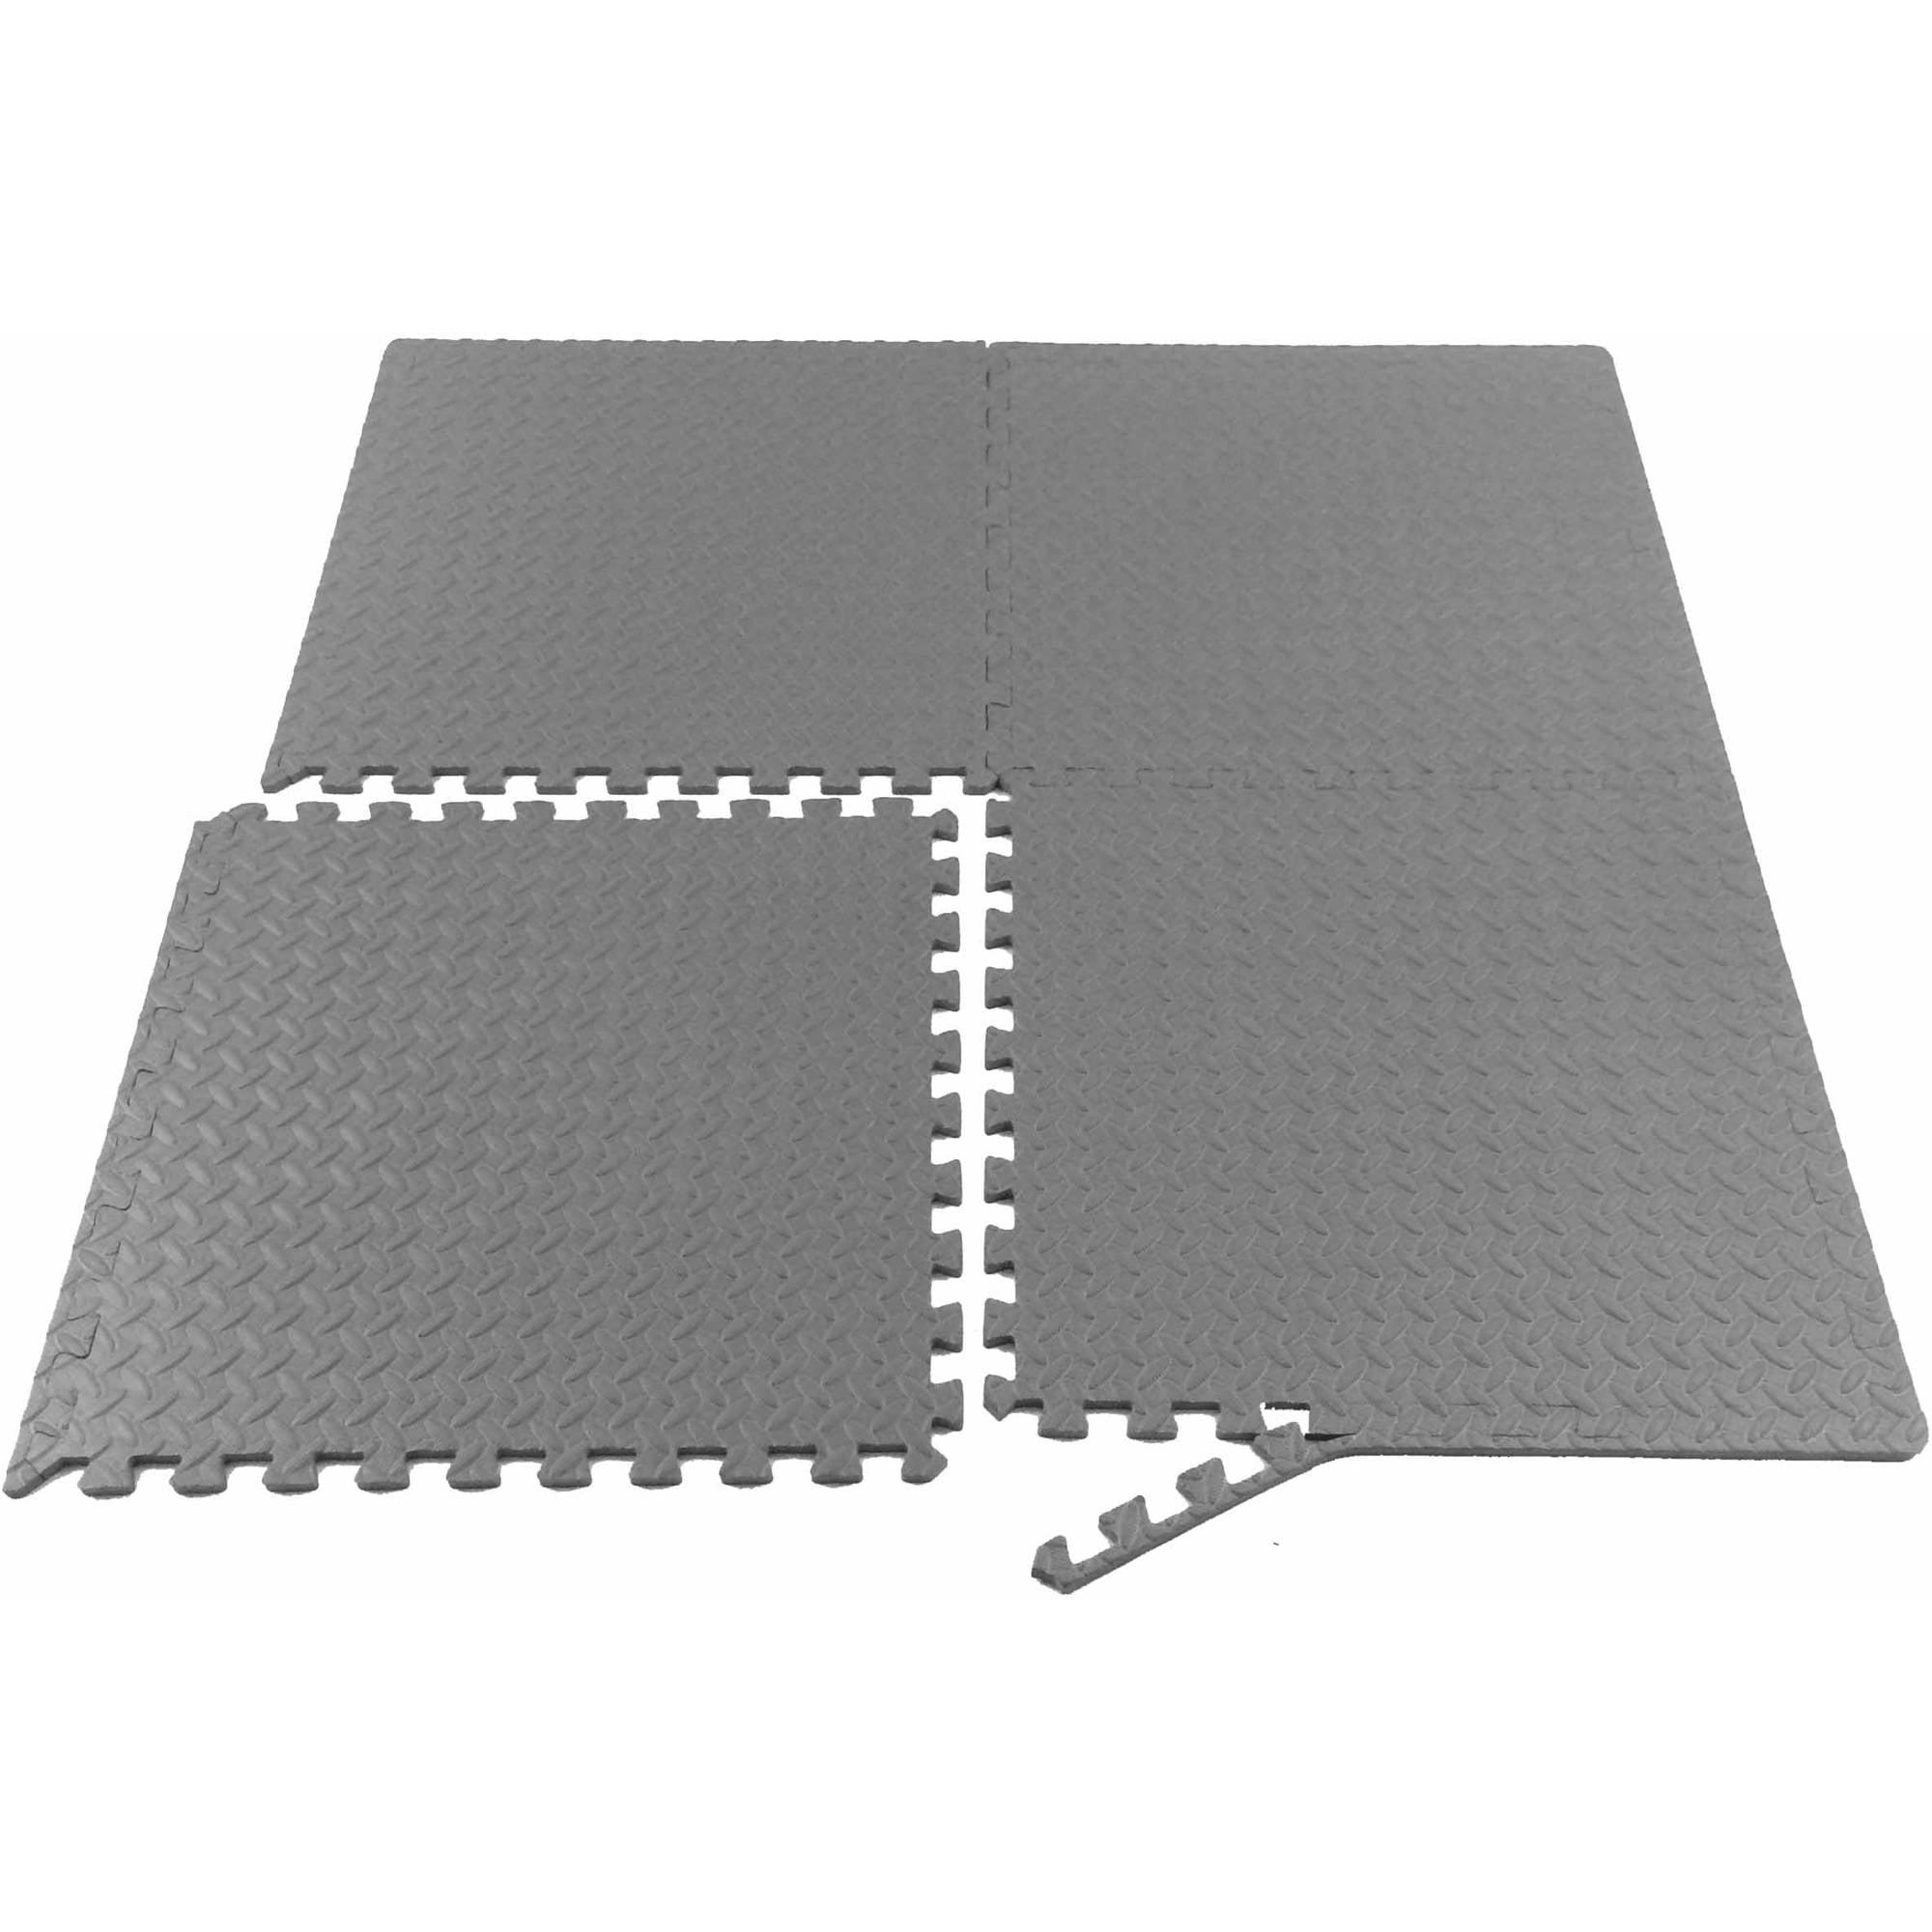 Floor mats for gym - Prosource Puzzle Exercise Mat Eva Foam Interlocking Tiles Walmart Com